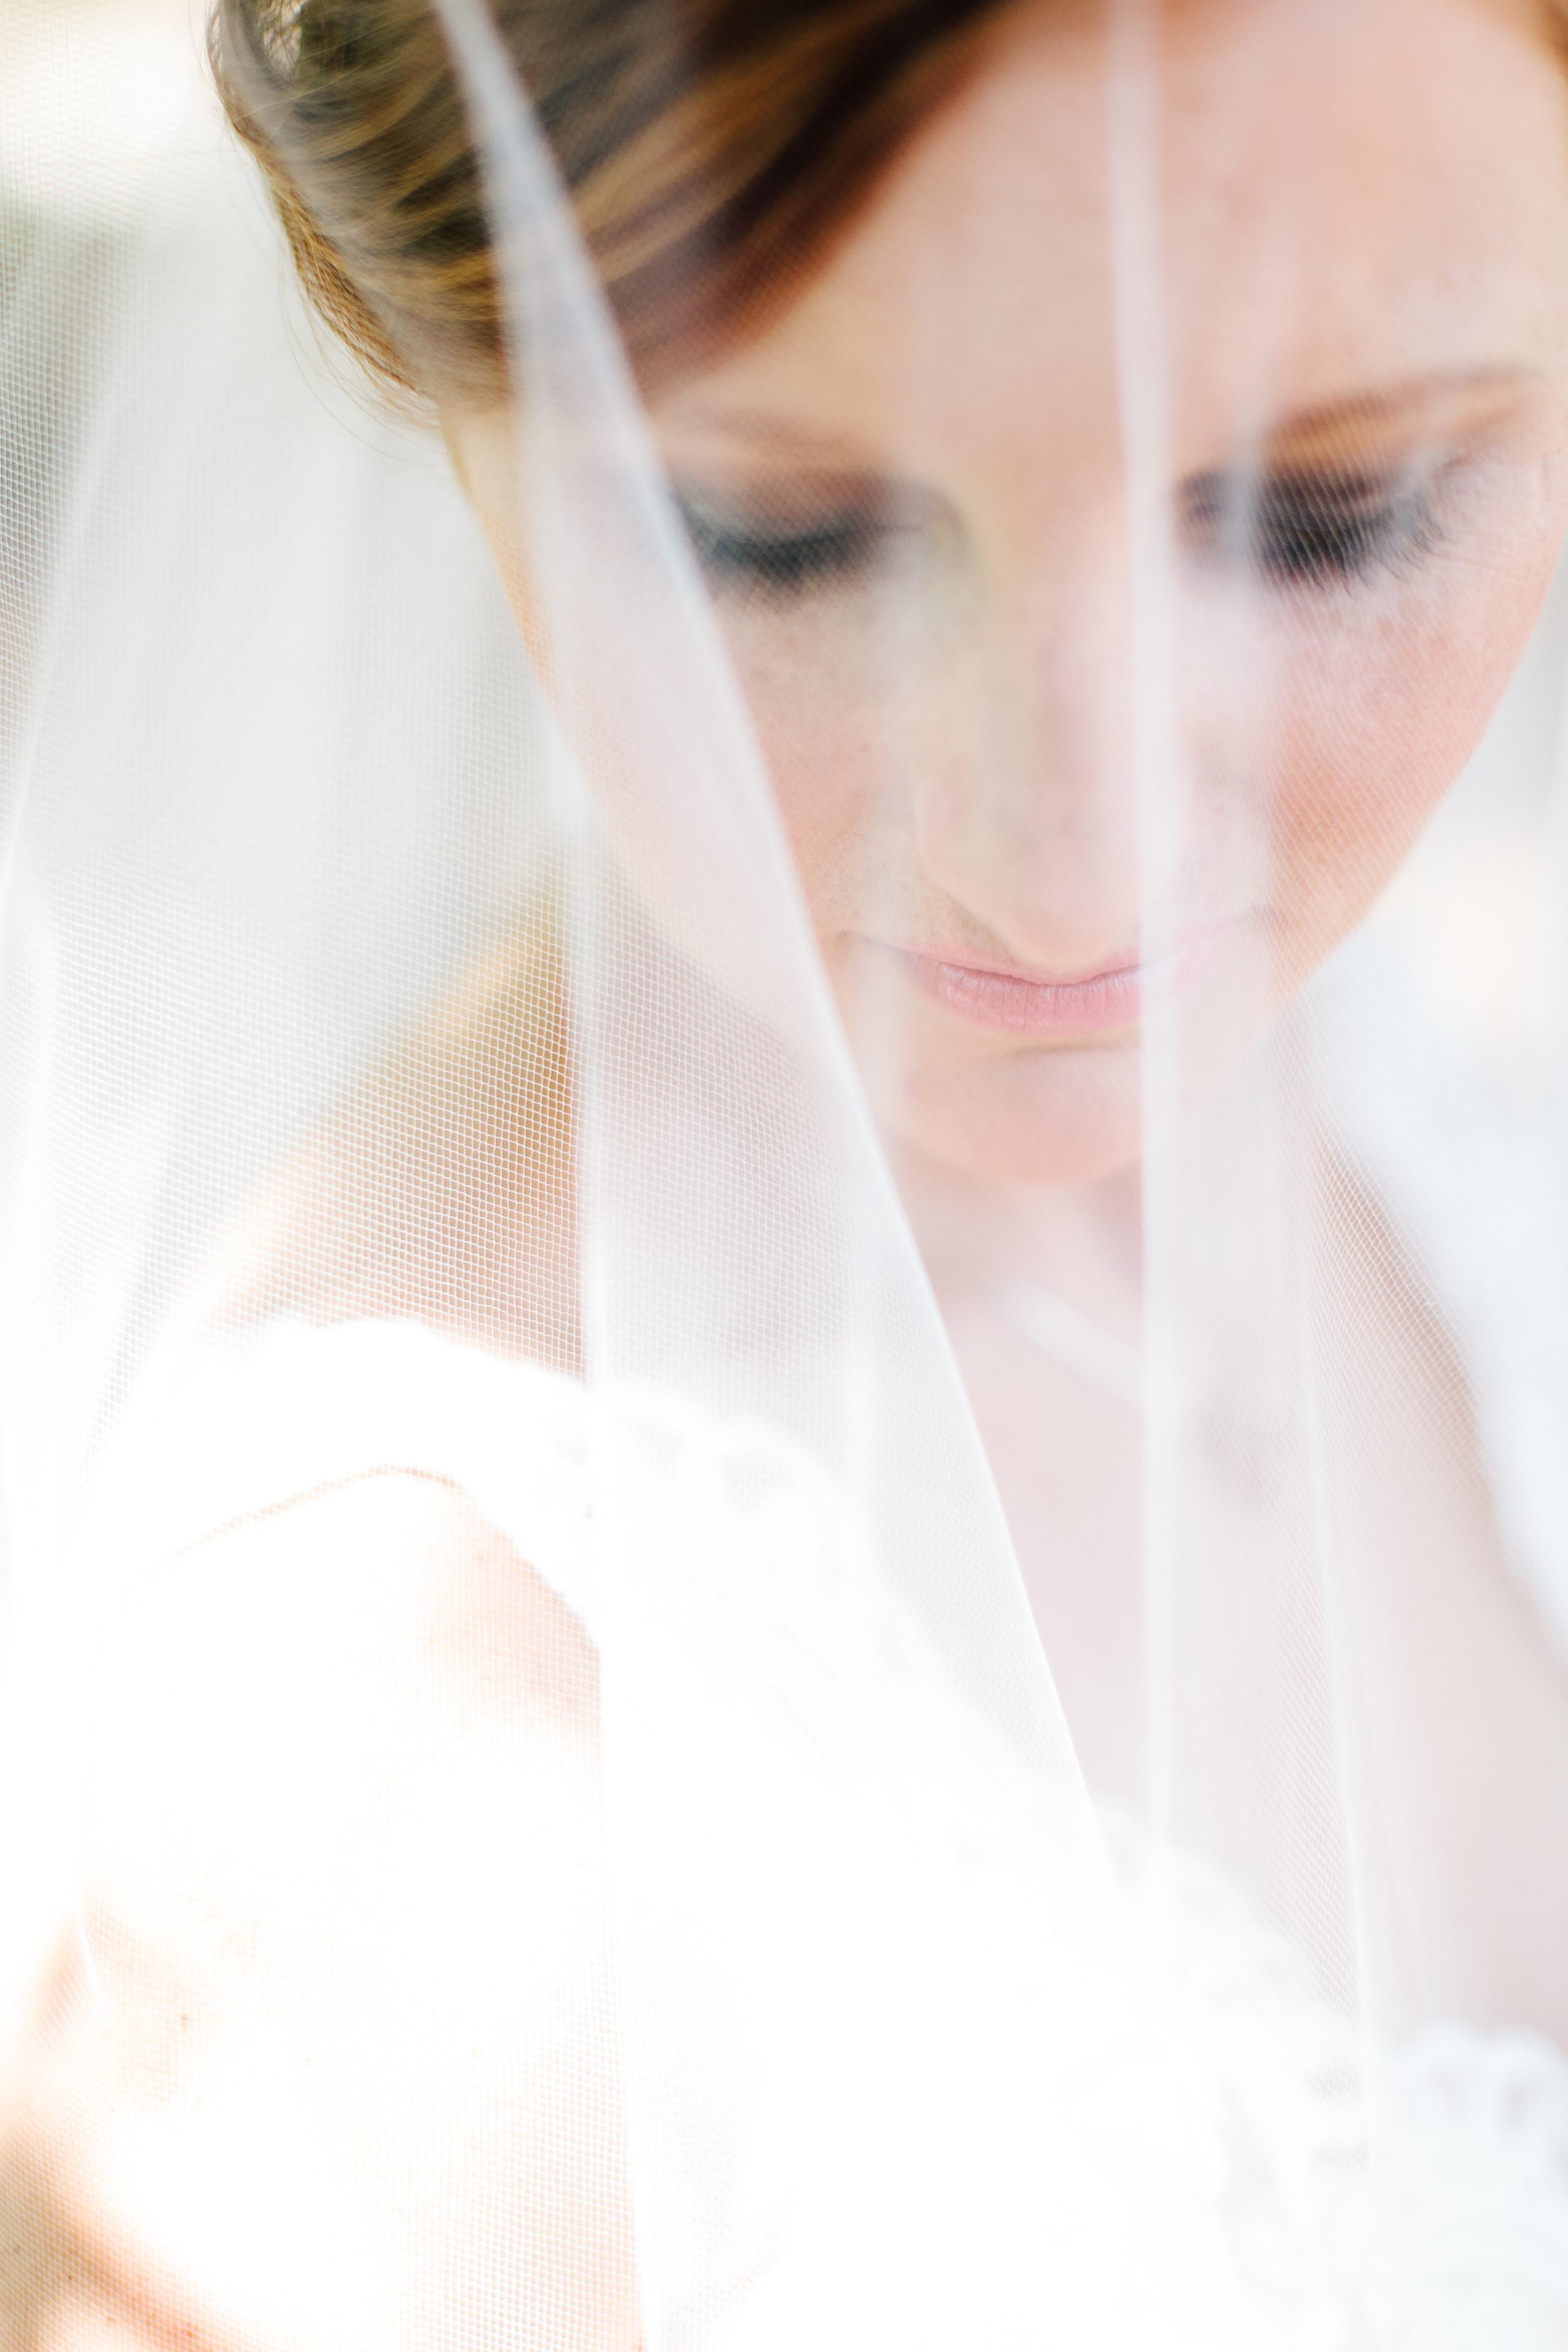 Kathryn-McCrary-Photography-Atlanta-Wedding-Photographer-1-2.jpg